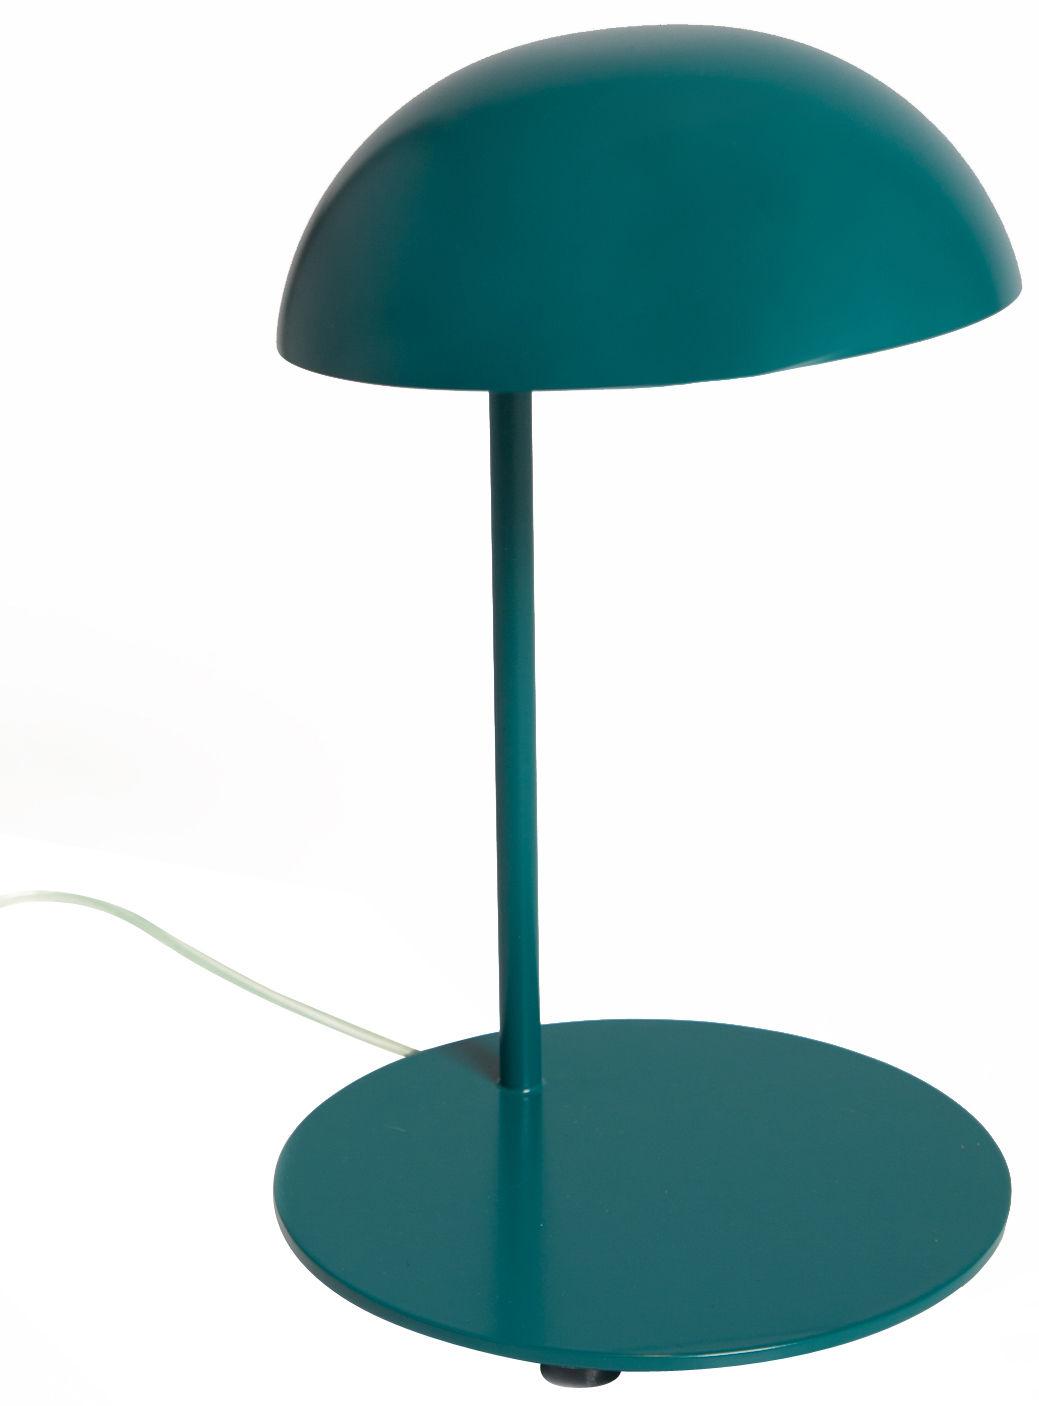 lampe de table pokko led bleu p trole gallery s bensimon